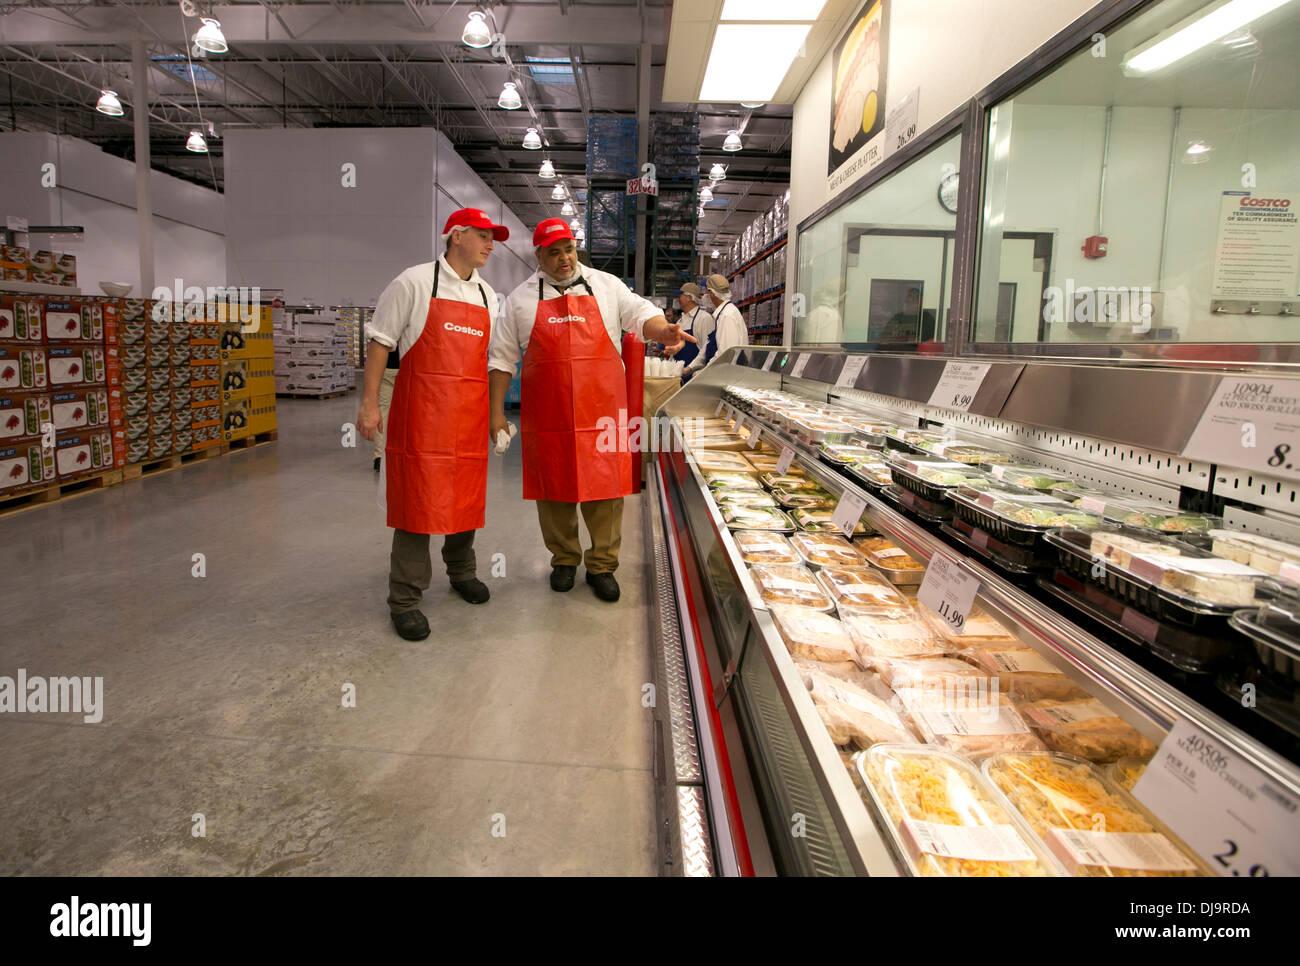 Costco Food Stock Photos & Costco Food Stock Images - Alamy